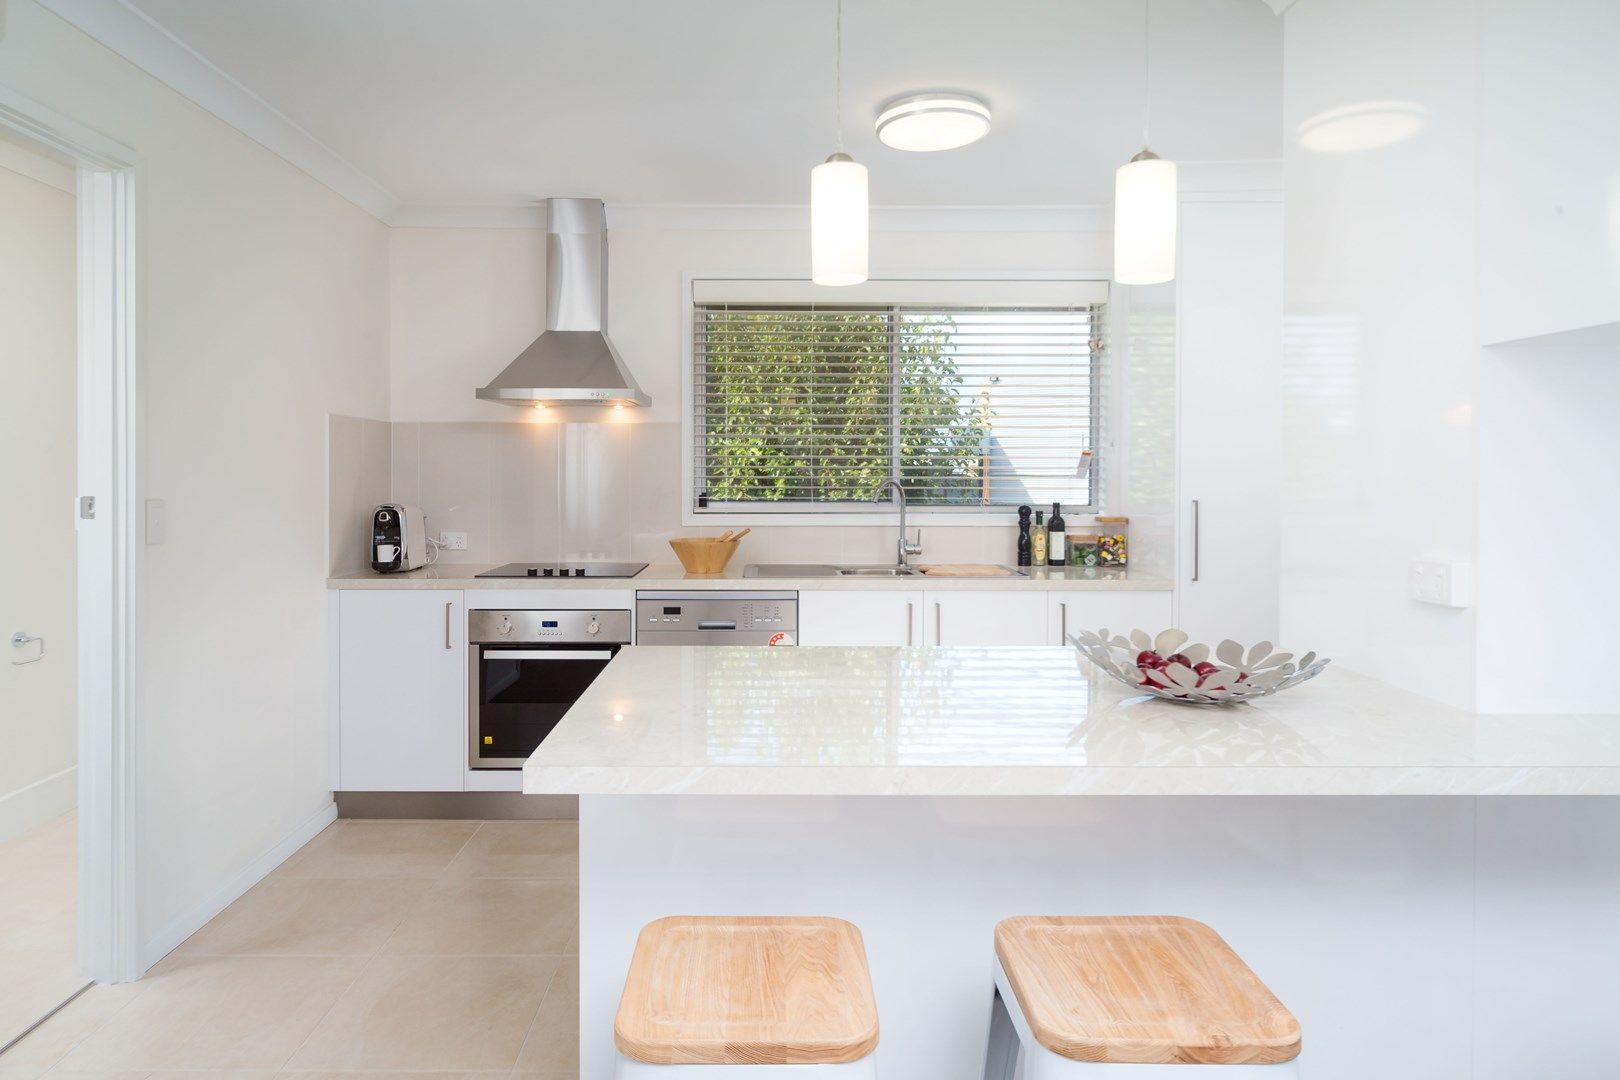 14/436 Macauley Street, Albury NSW 2640, Image 0